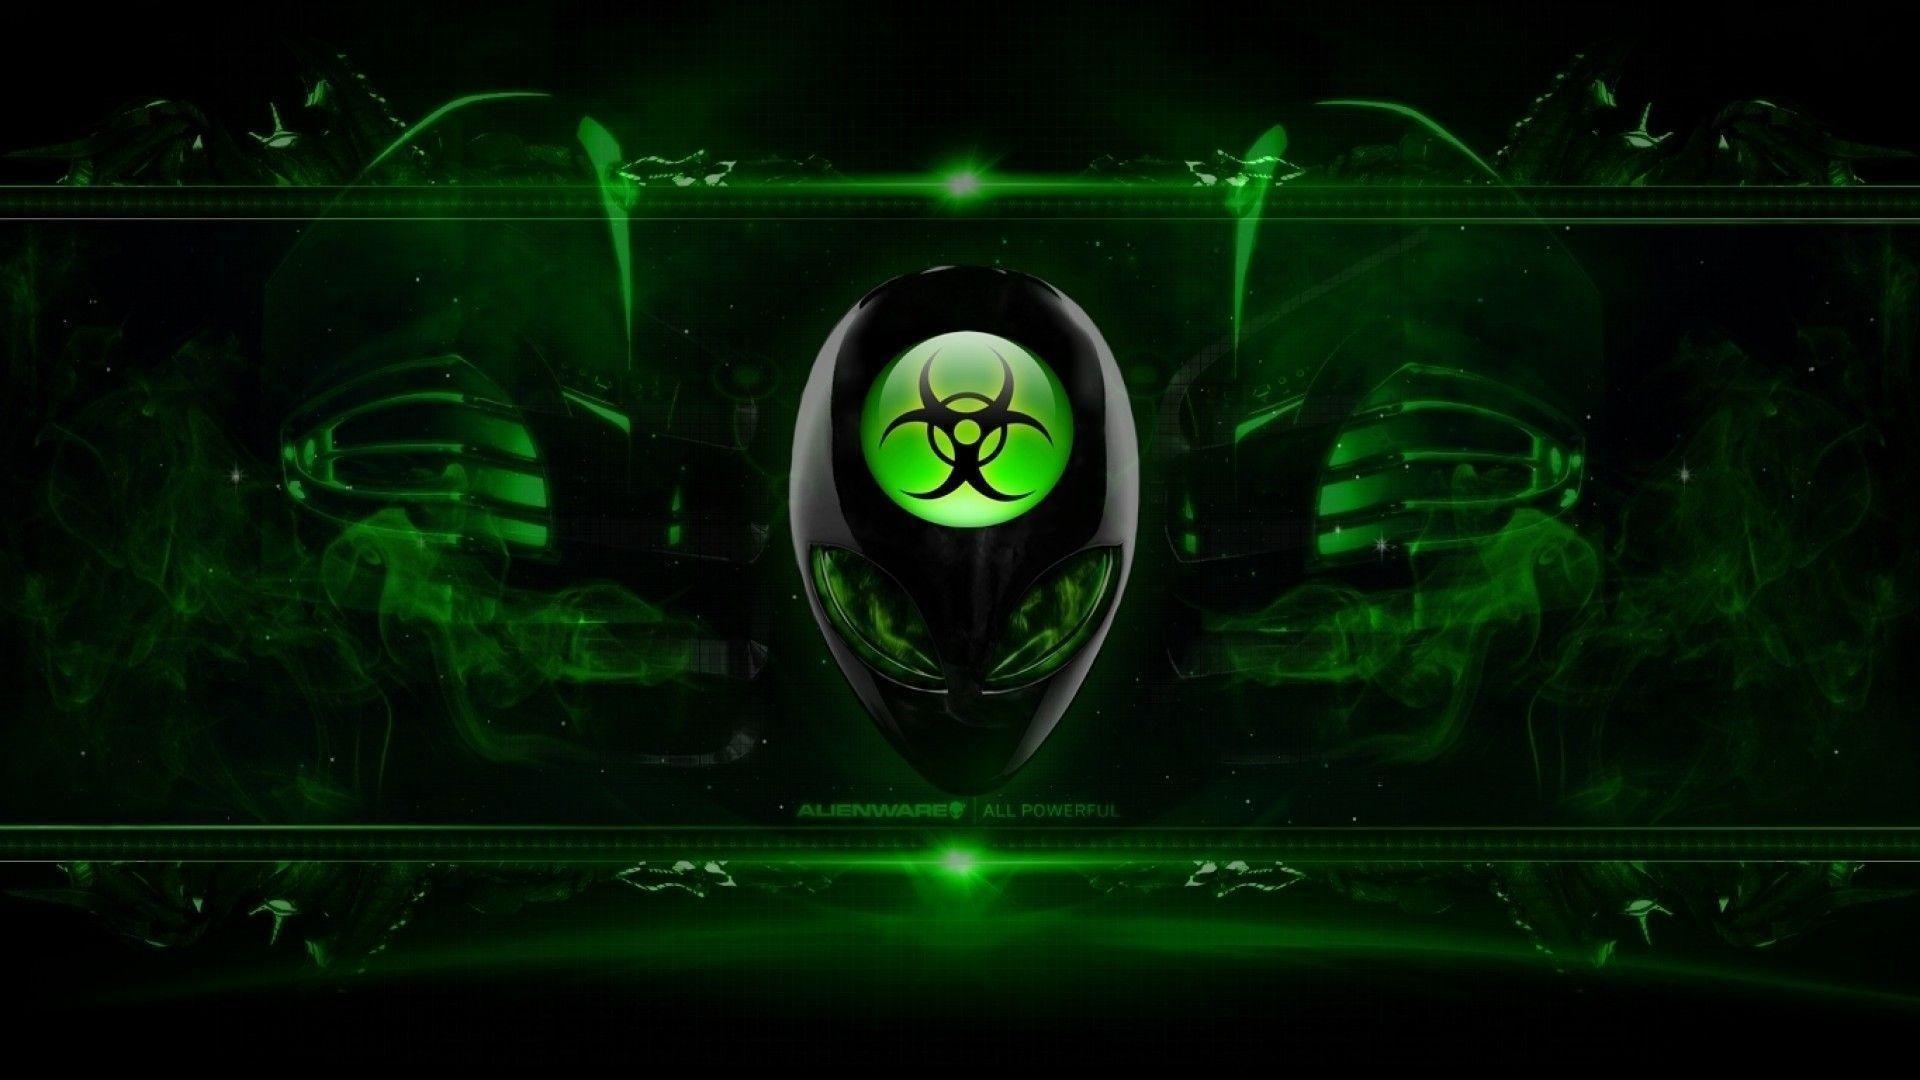 Green And Black Alienware Hd Wallpaper